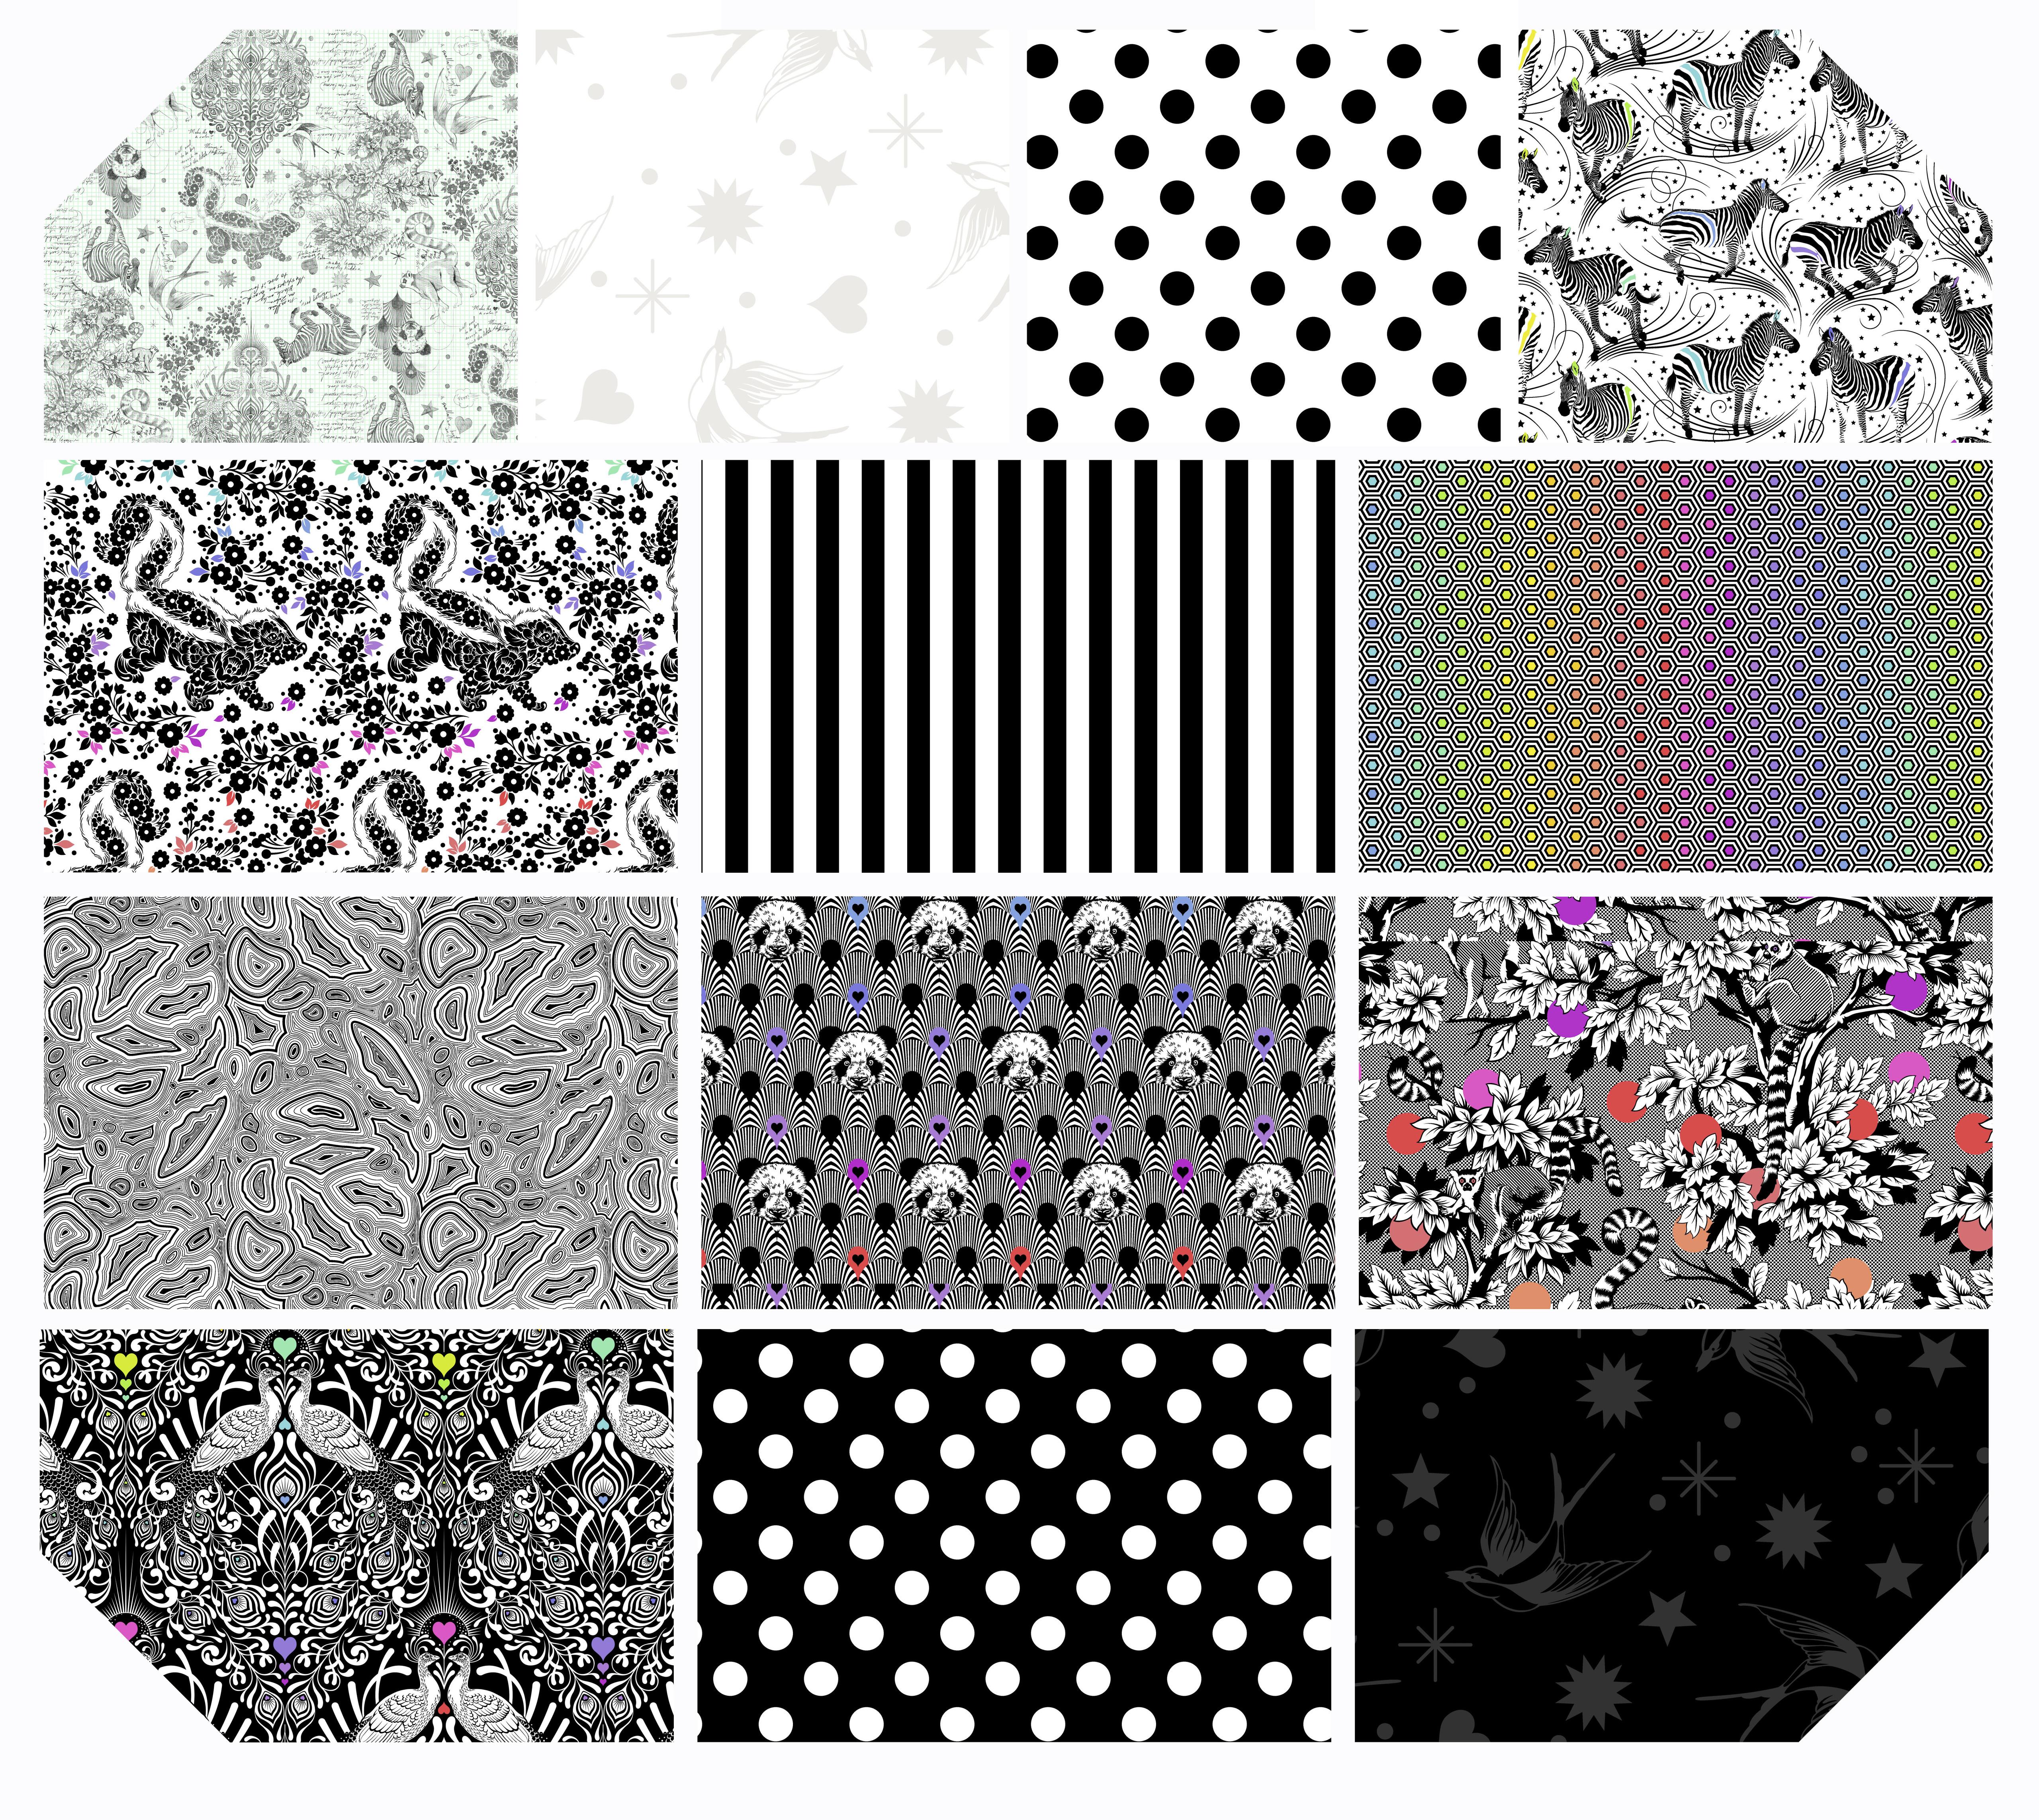 Linework - Hexagon